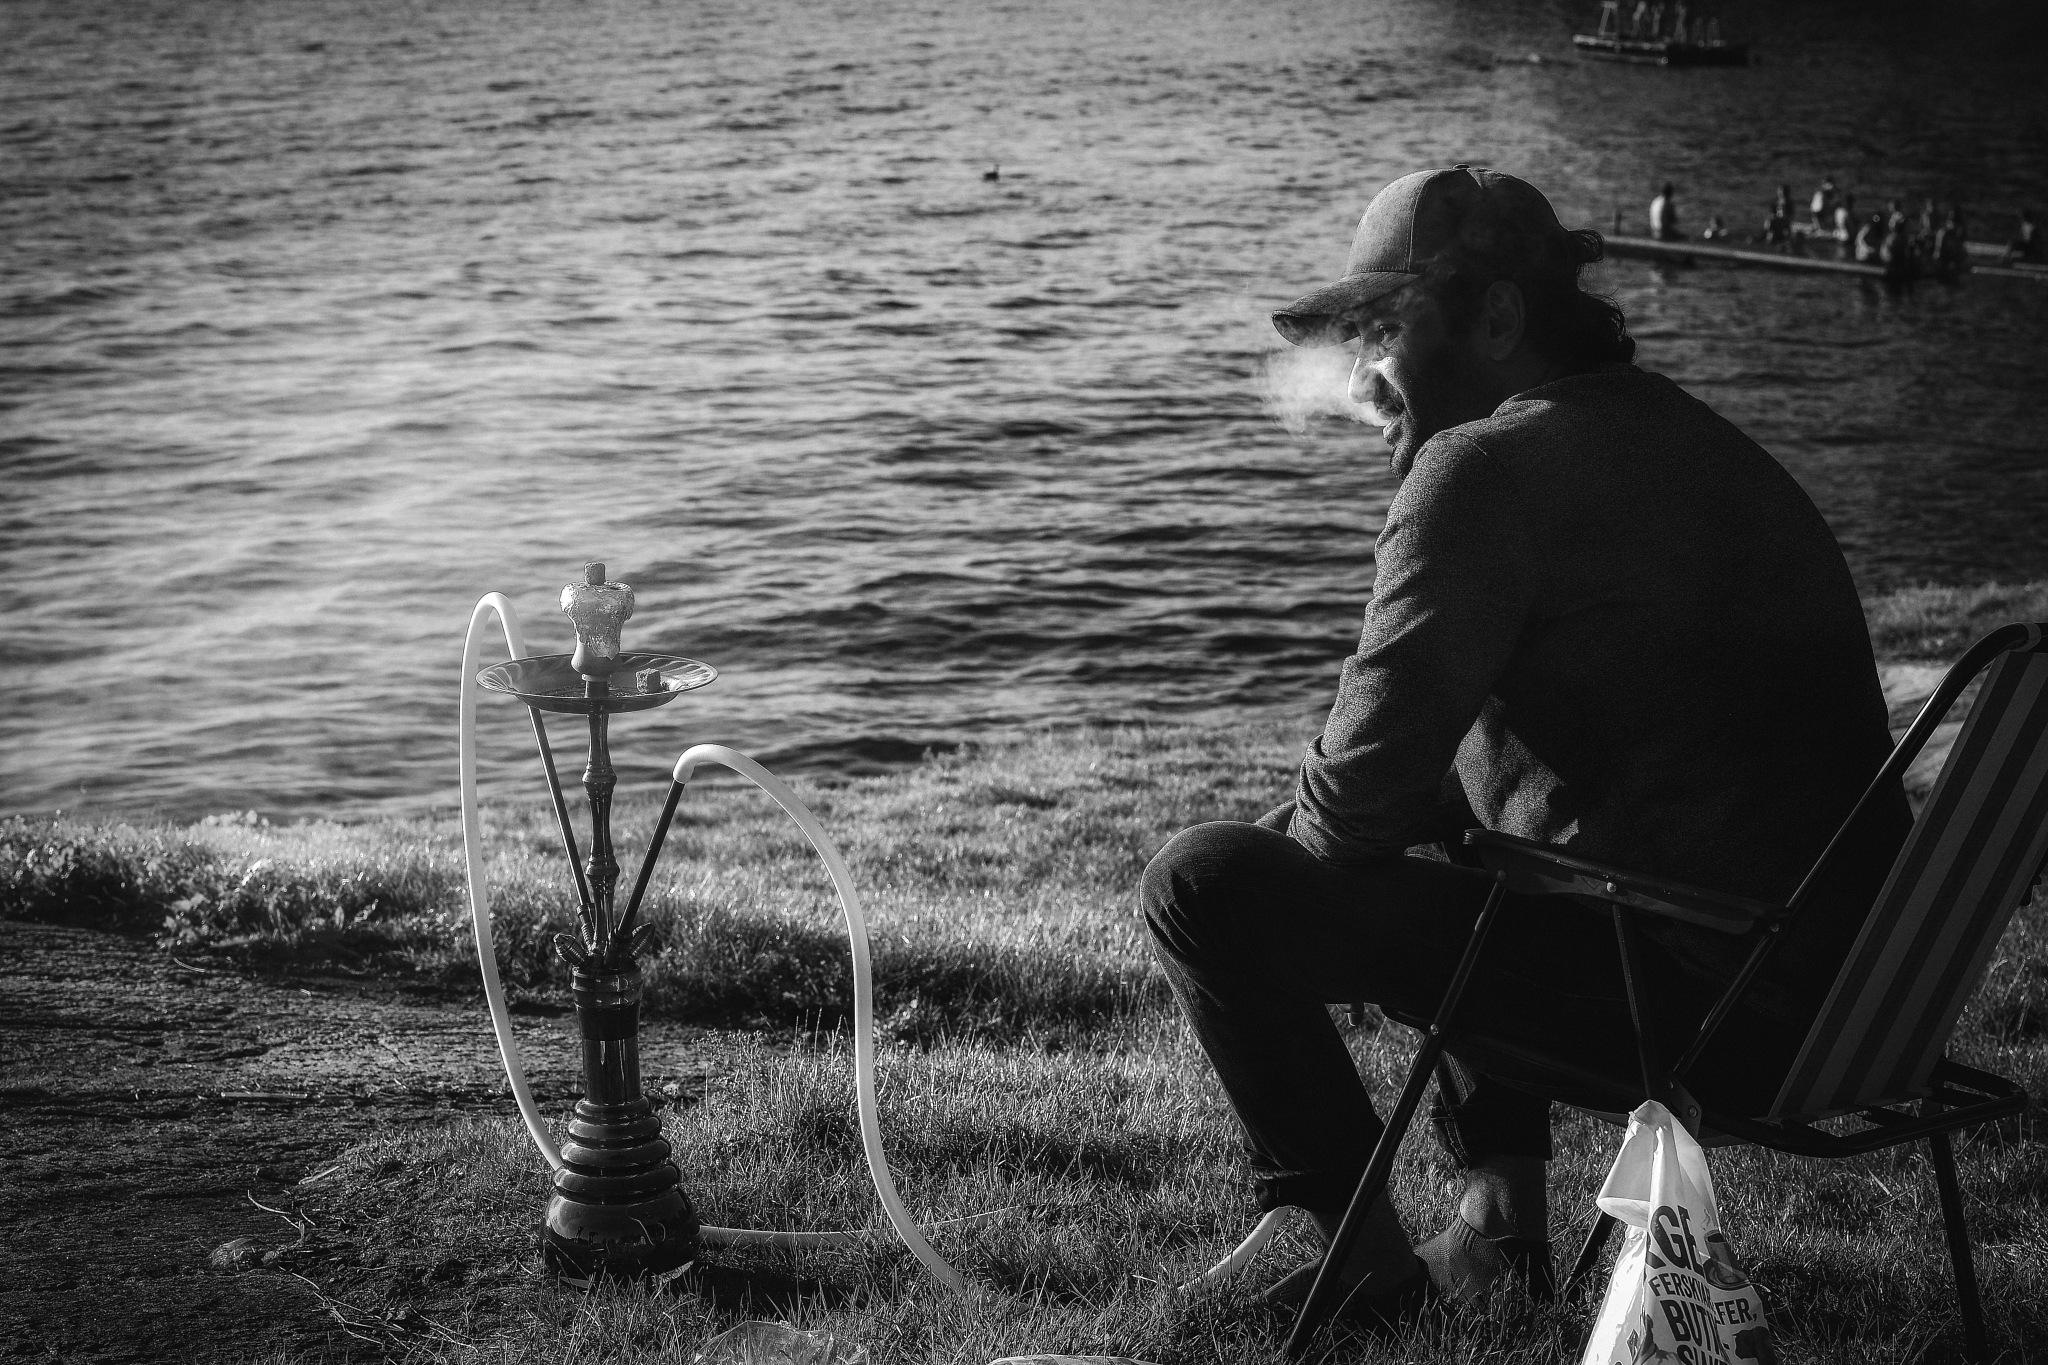 Shisha / Narghile at Oslo Fjord by Goran Jorganovich